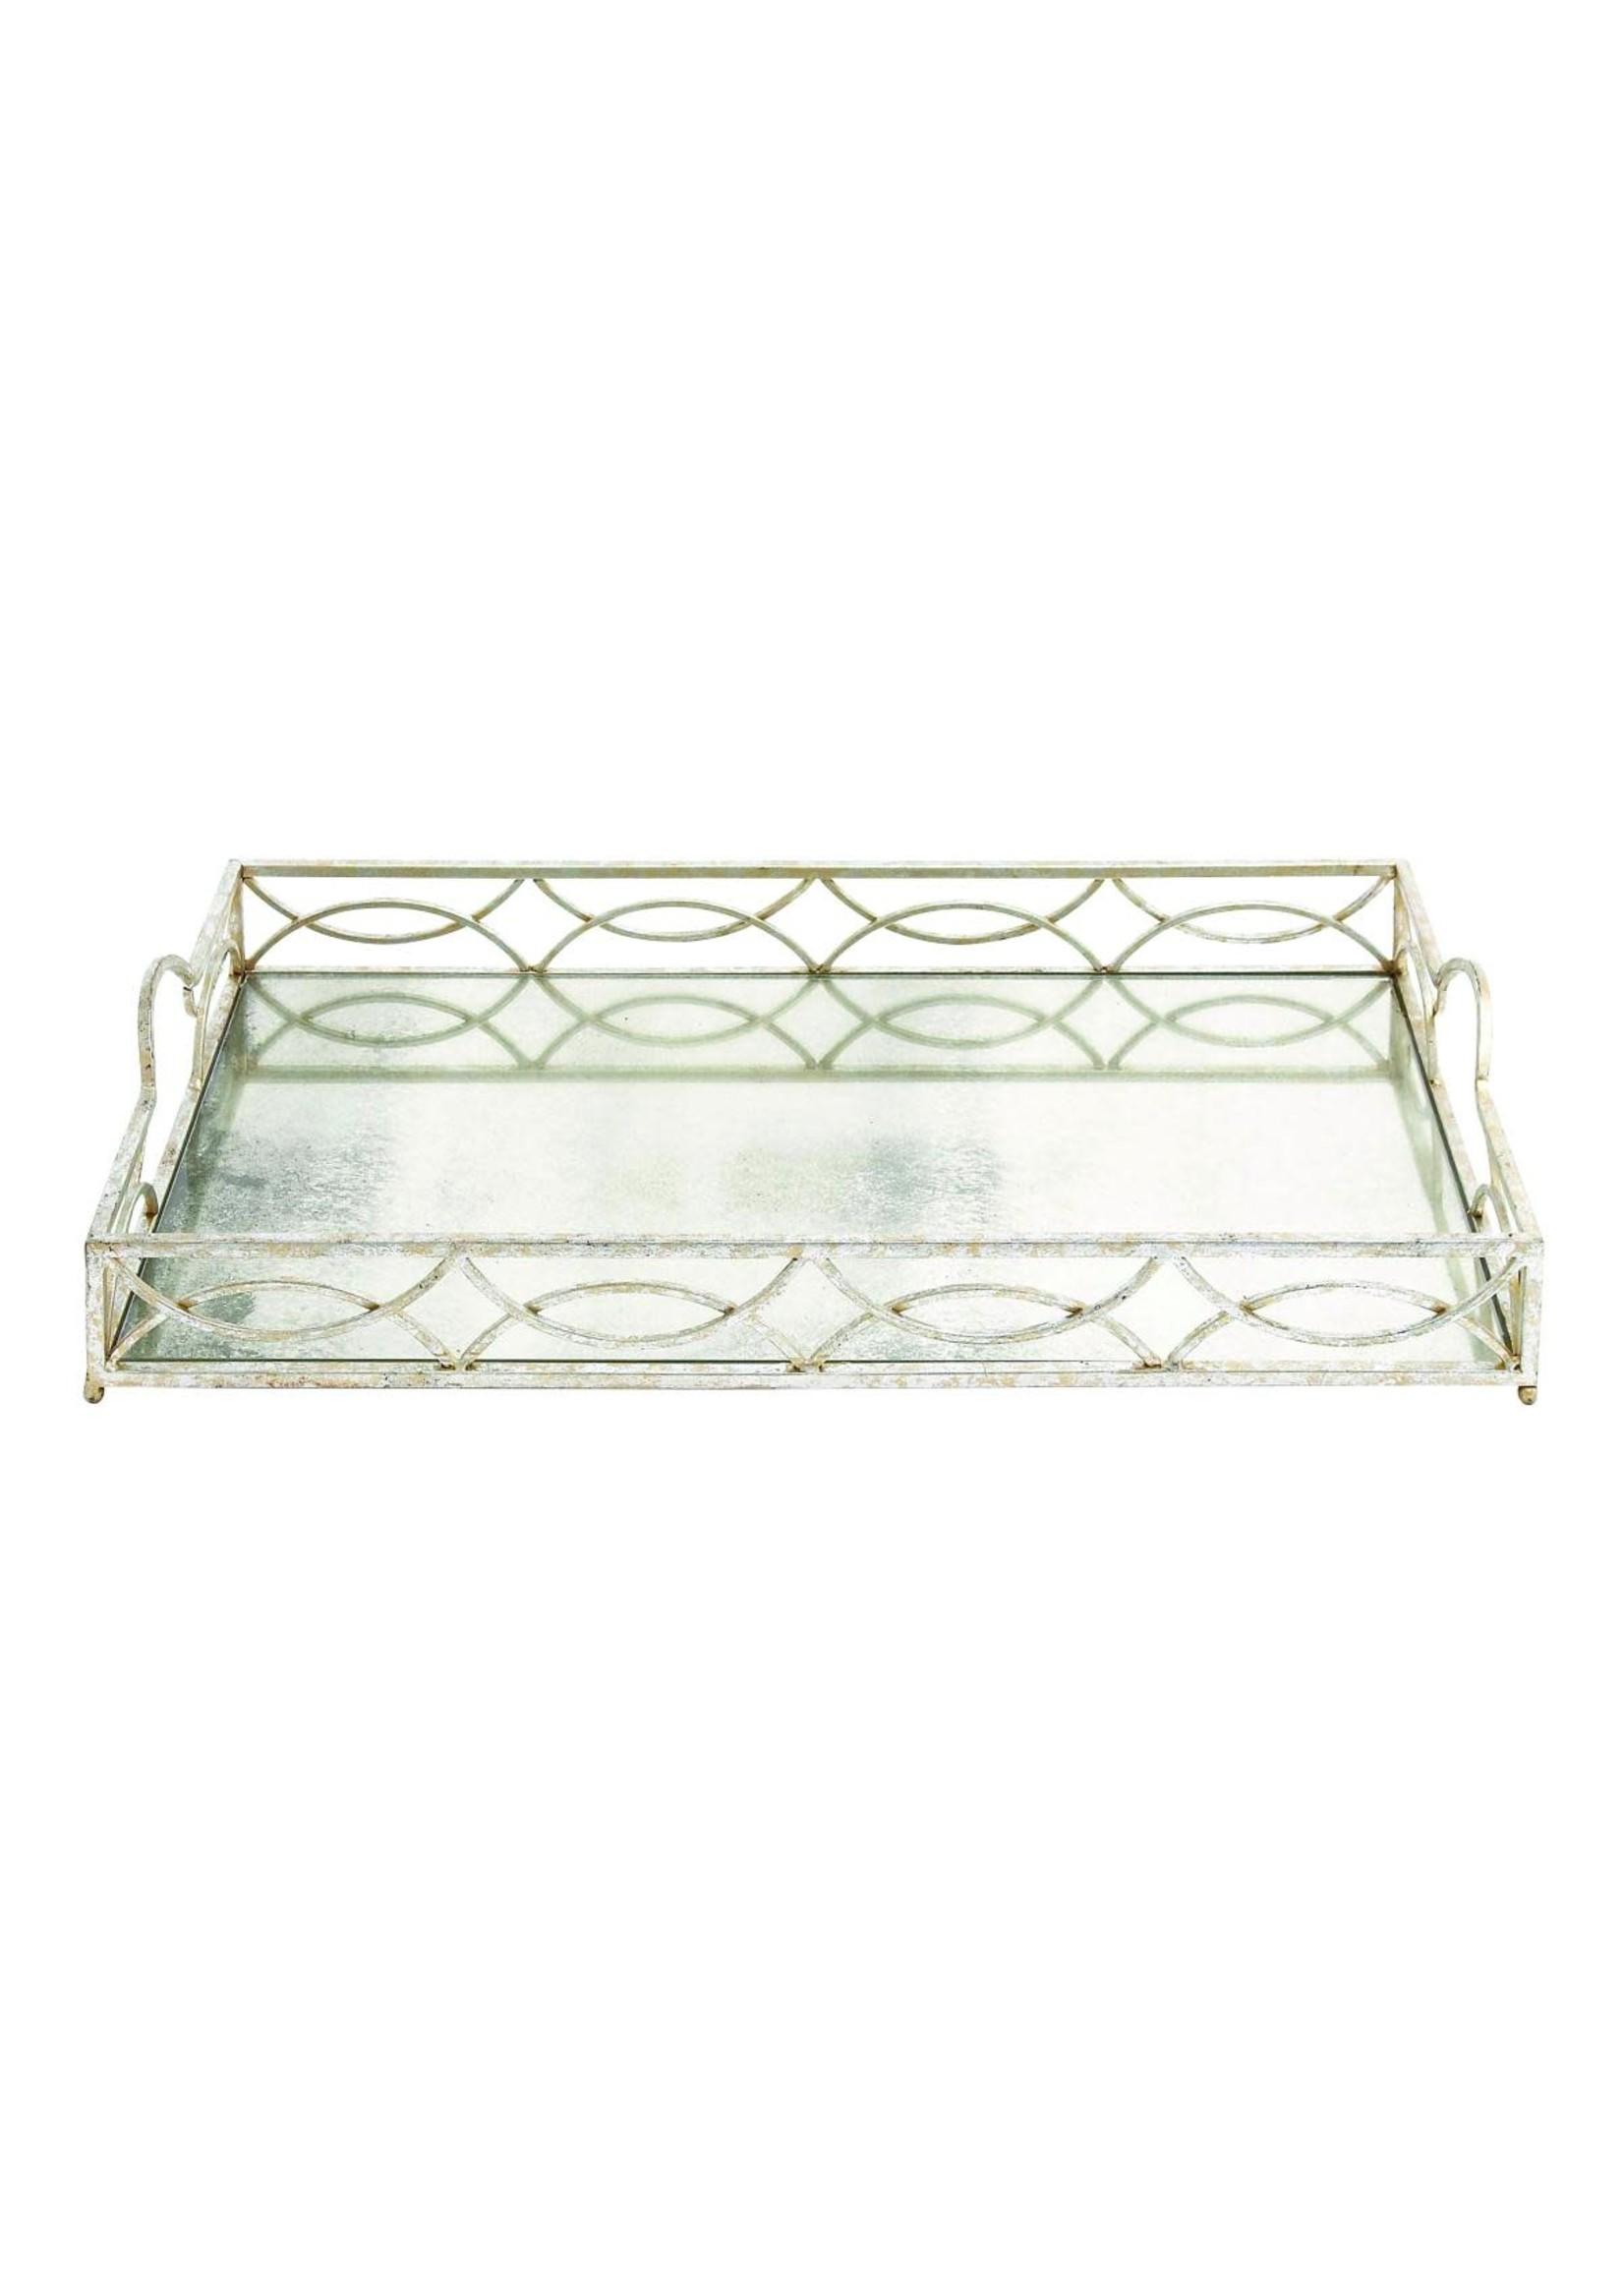 UMA Enterprises Metal Mirror Tray